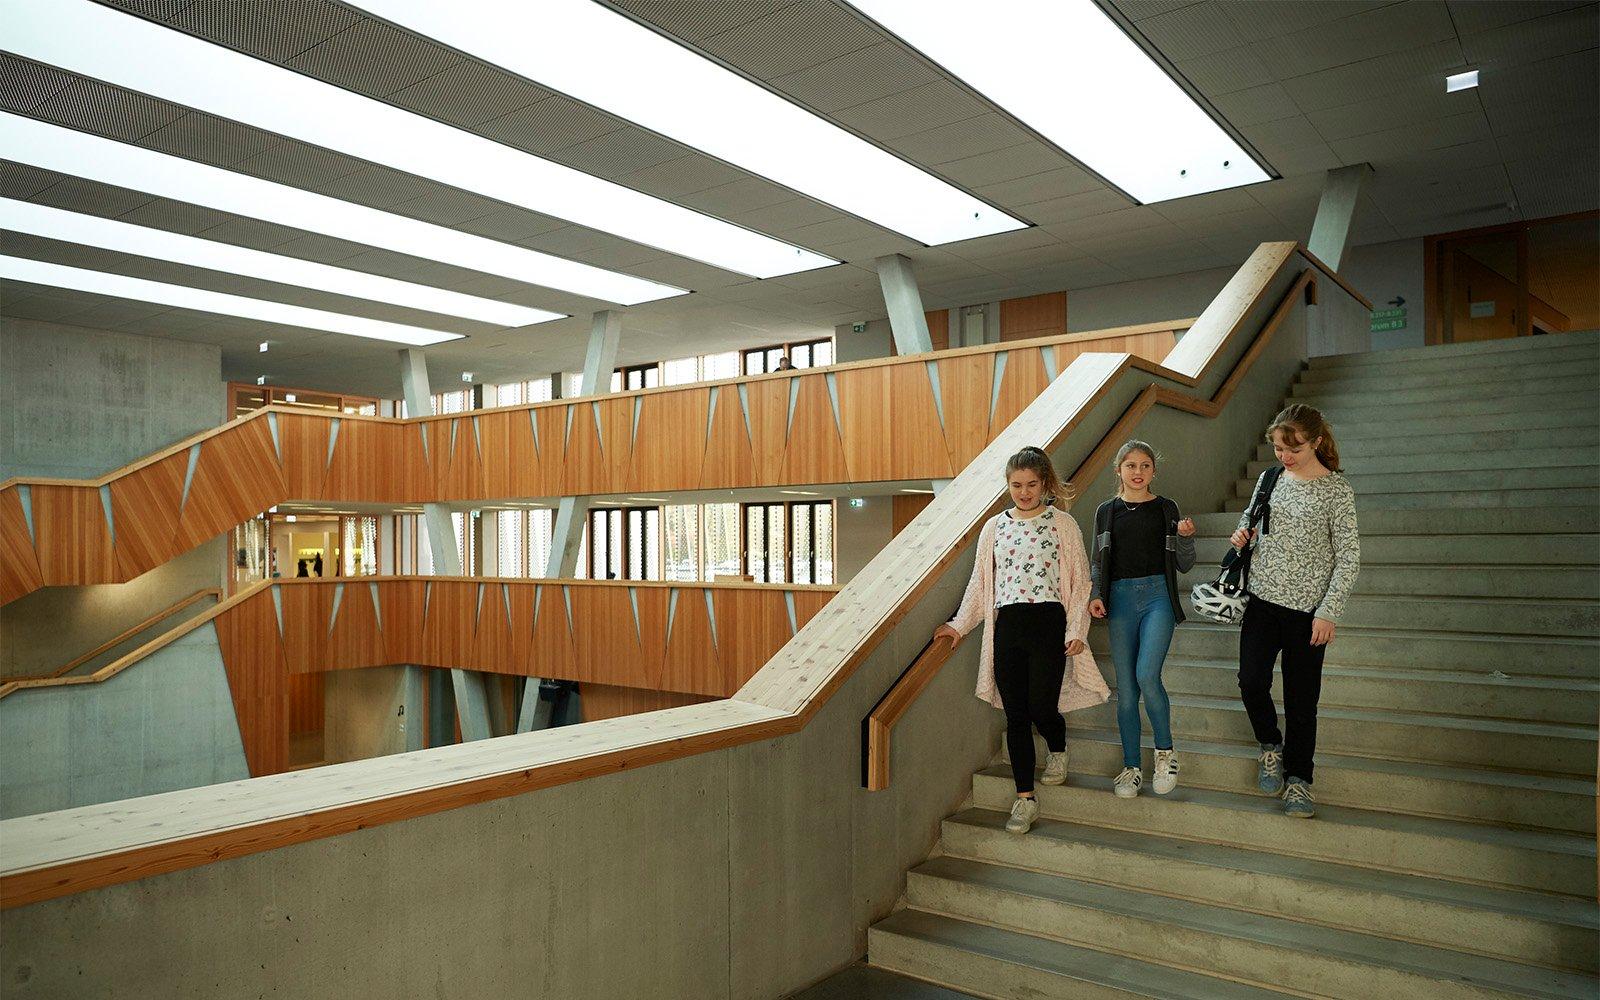 Atrium ovenlys vinduer på Hessenwald skolen i Tyskland